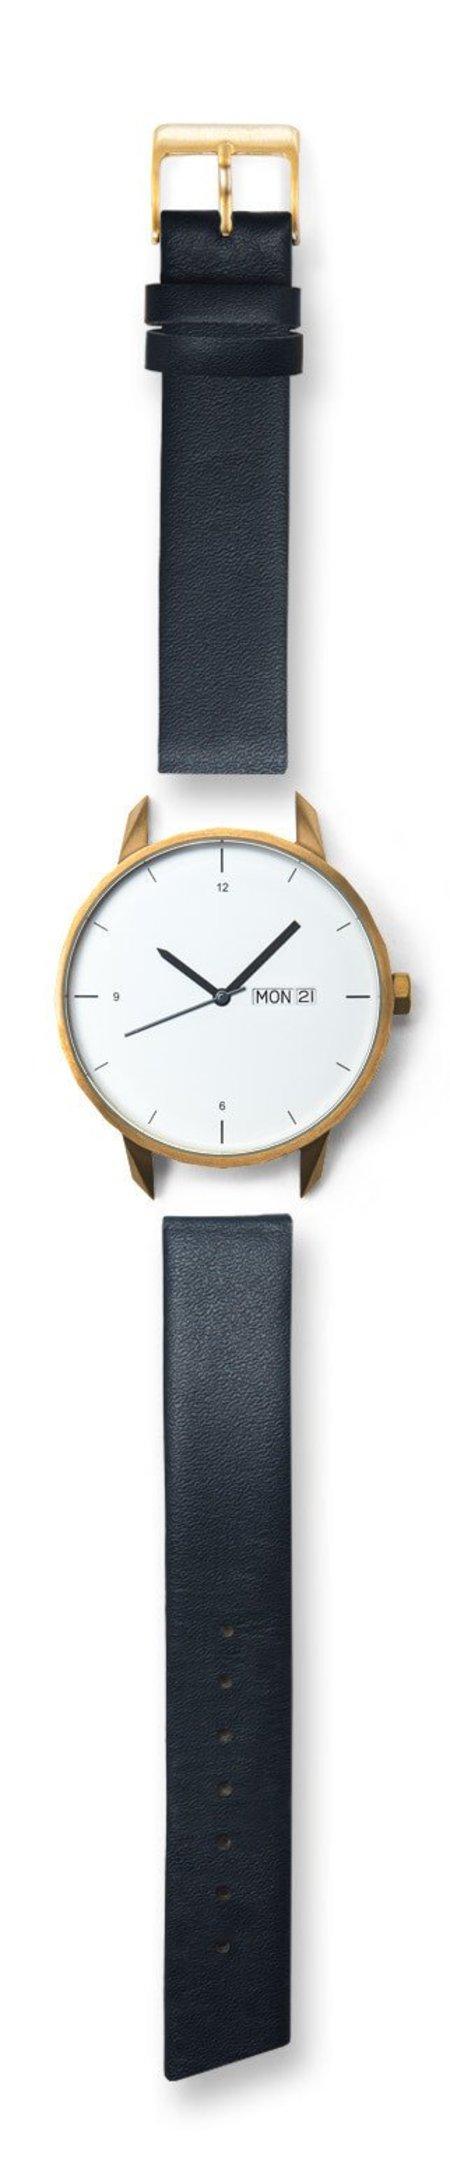 Unisex Tinker Watches 42mm Gold Watch Navy Strap